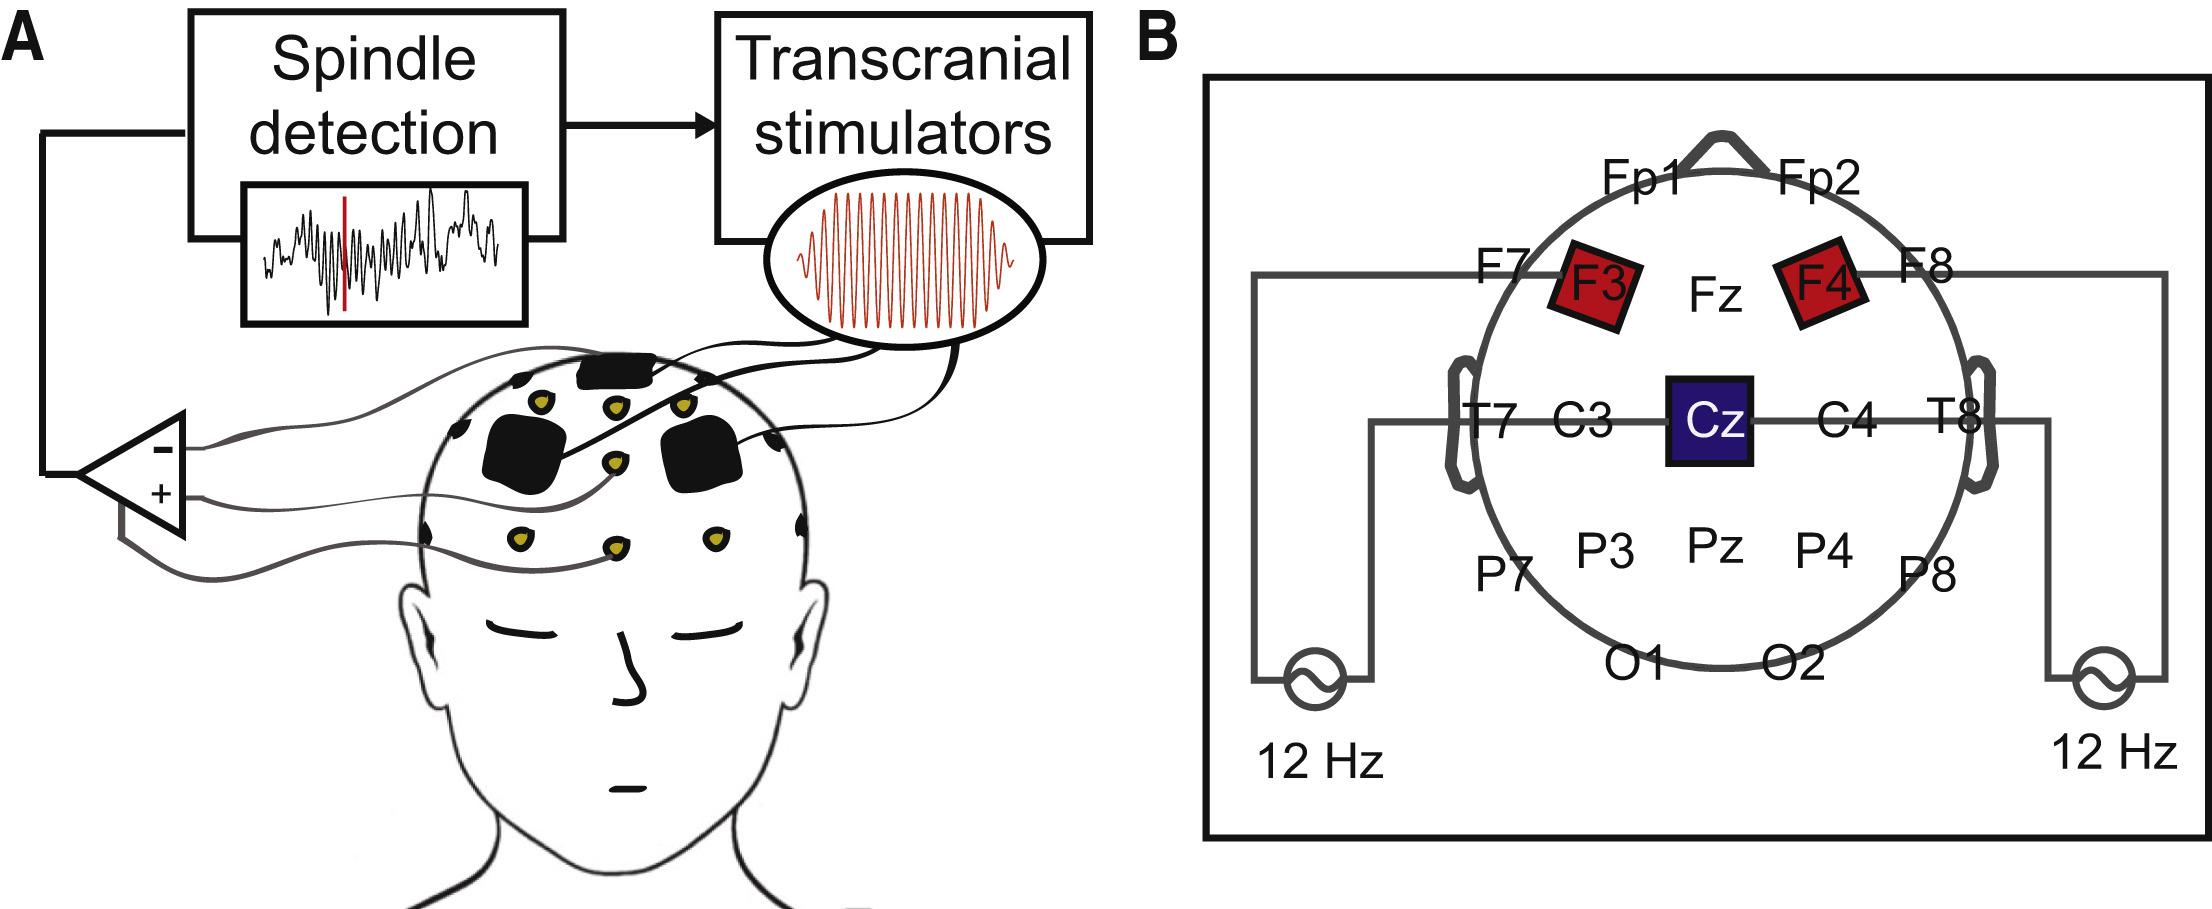 Feedback Controlled Transcranial Alternating Current